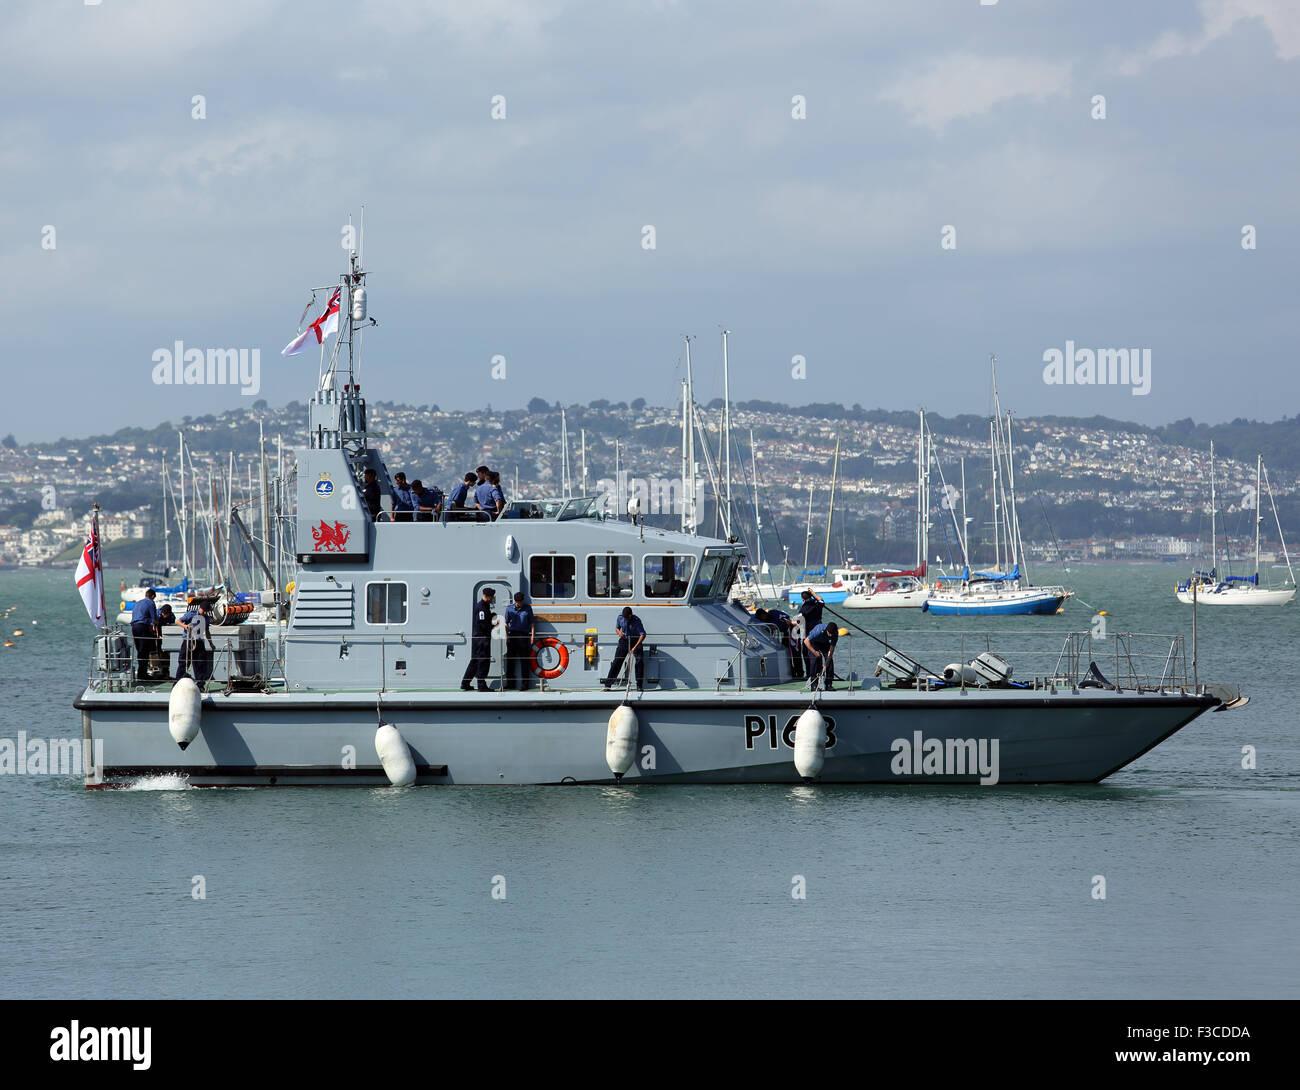 HMS Express, P163, visiting Brixham, Devon, England, UK Stock Photo